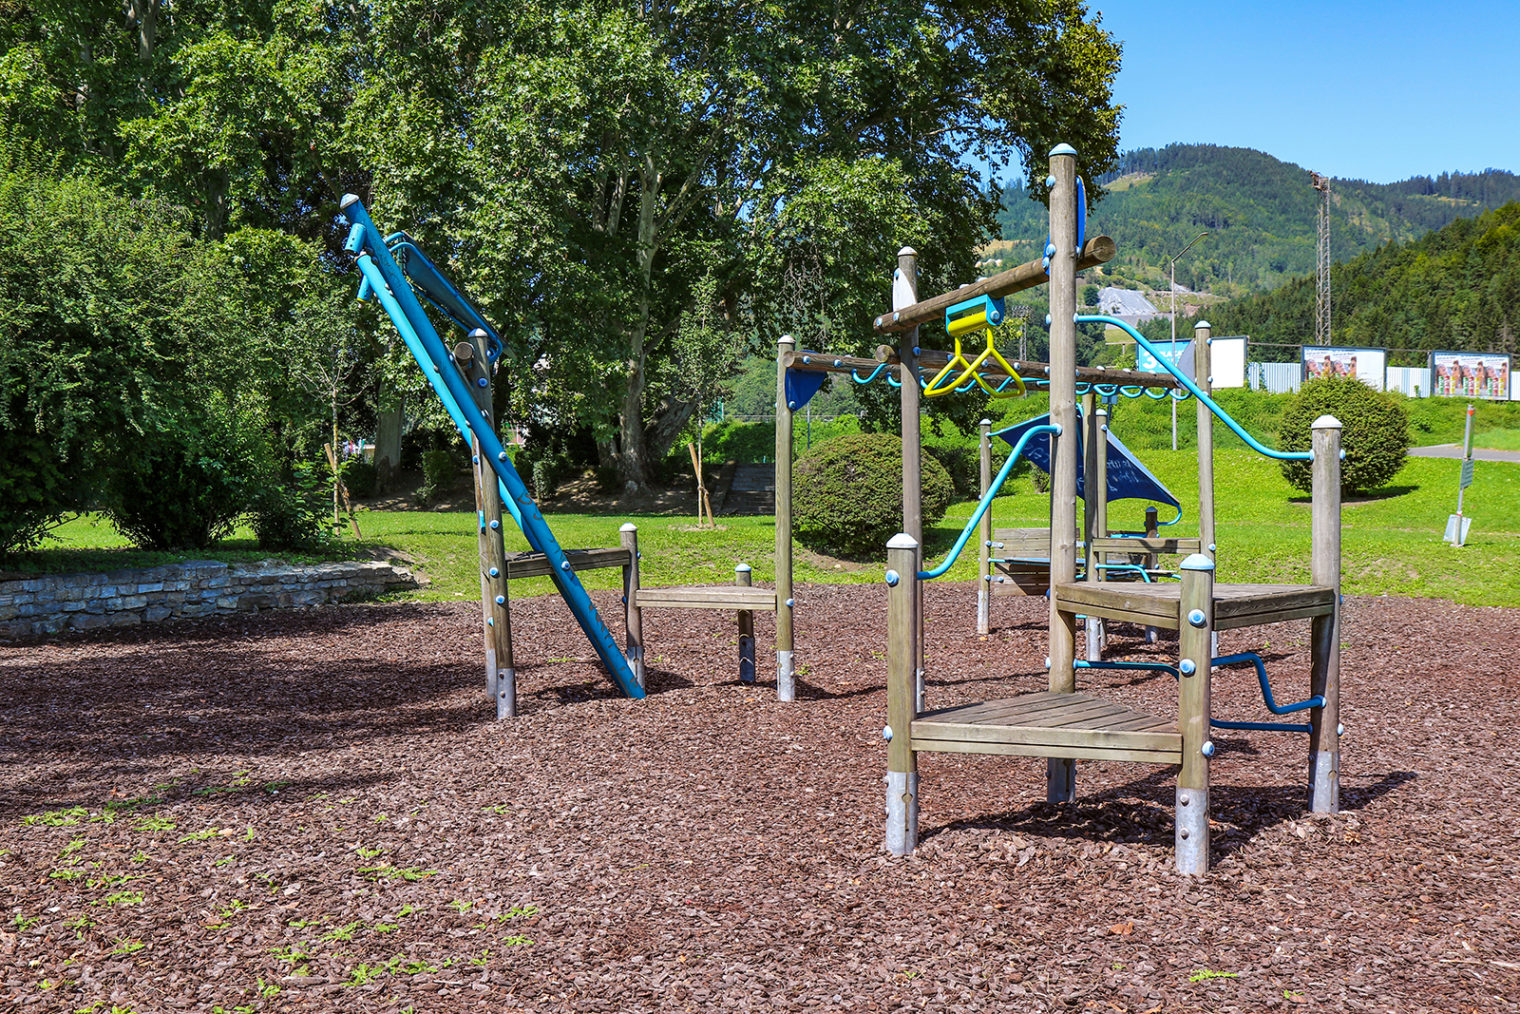 Play equipment at the Pestalozzipark playground